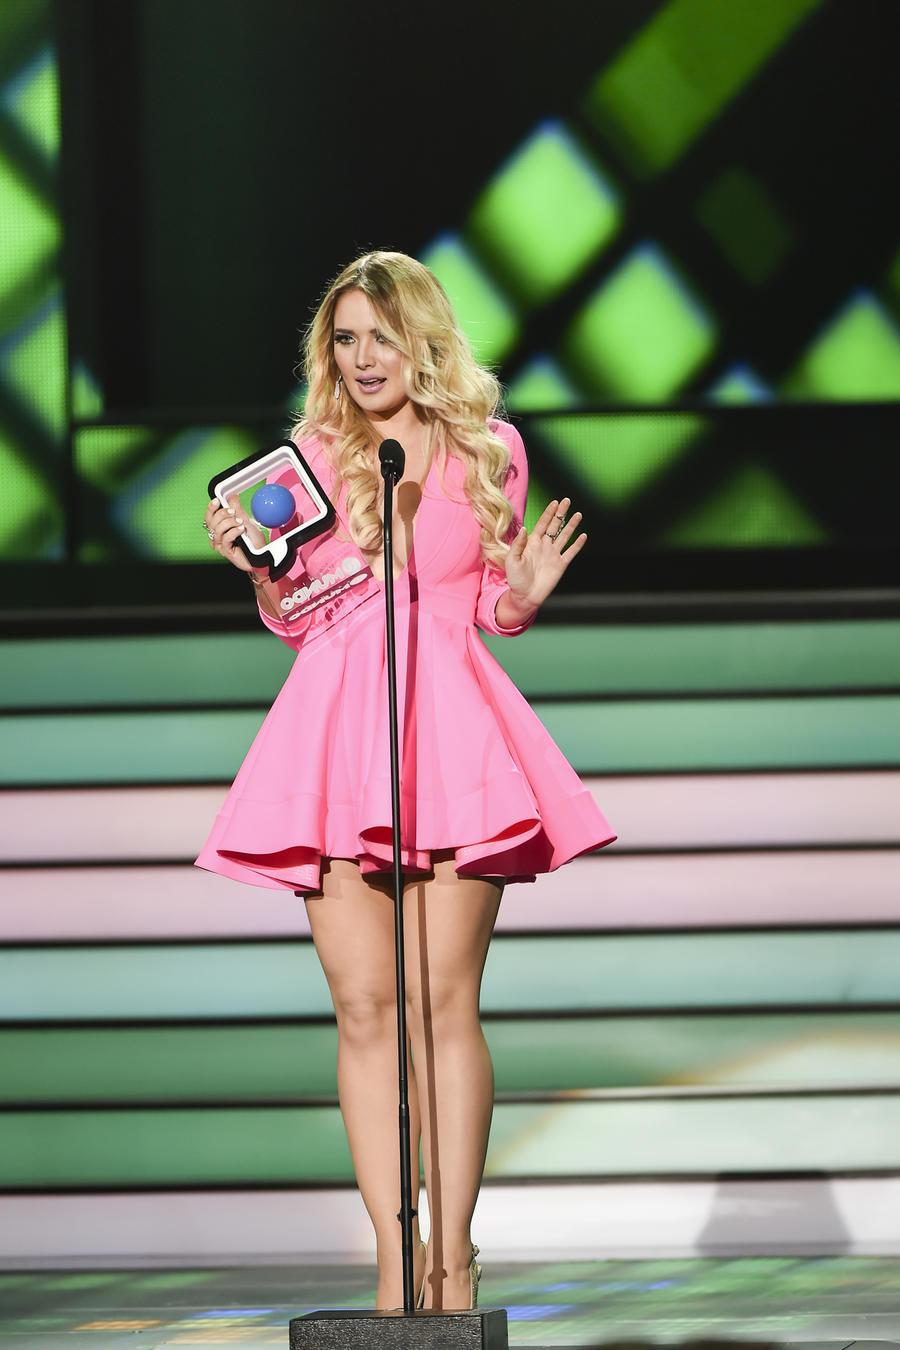 Kimberly Dos Ramos accepting her award at Premios Tu Mundo 2015